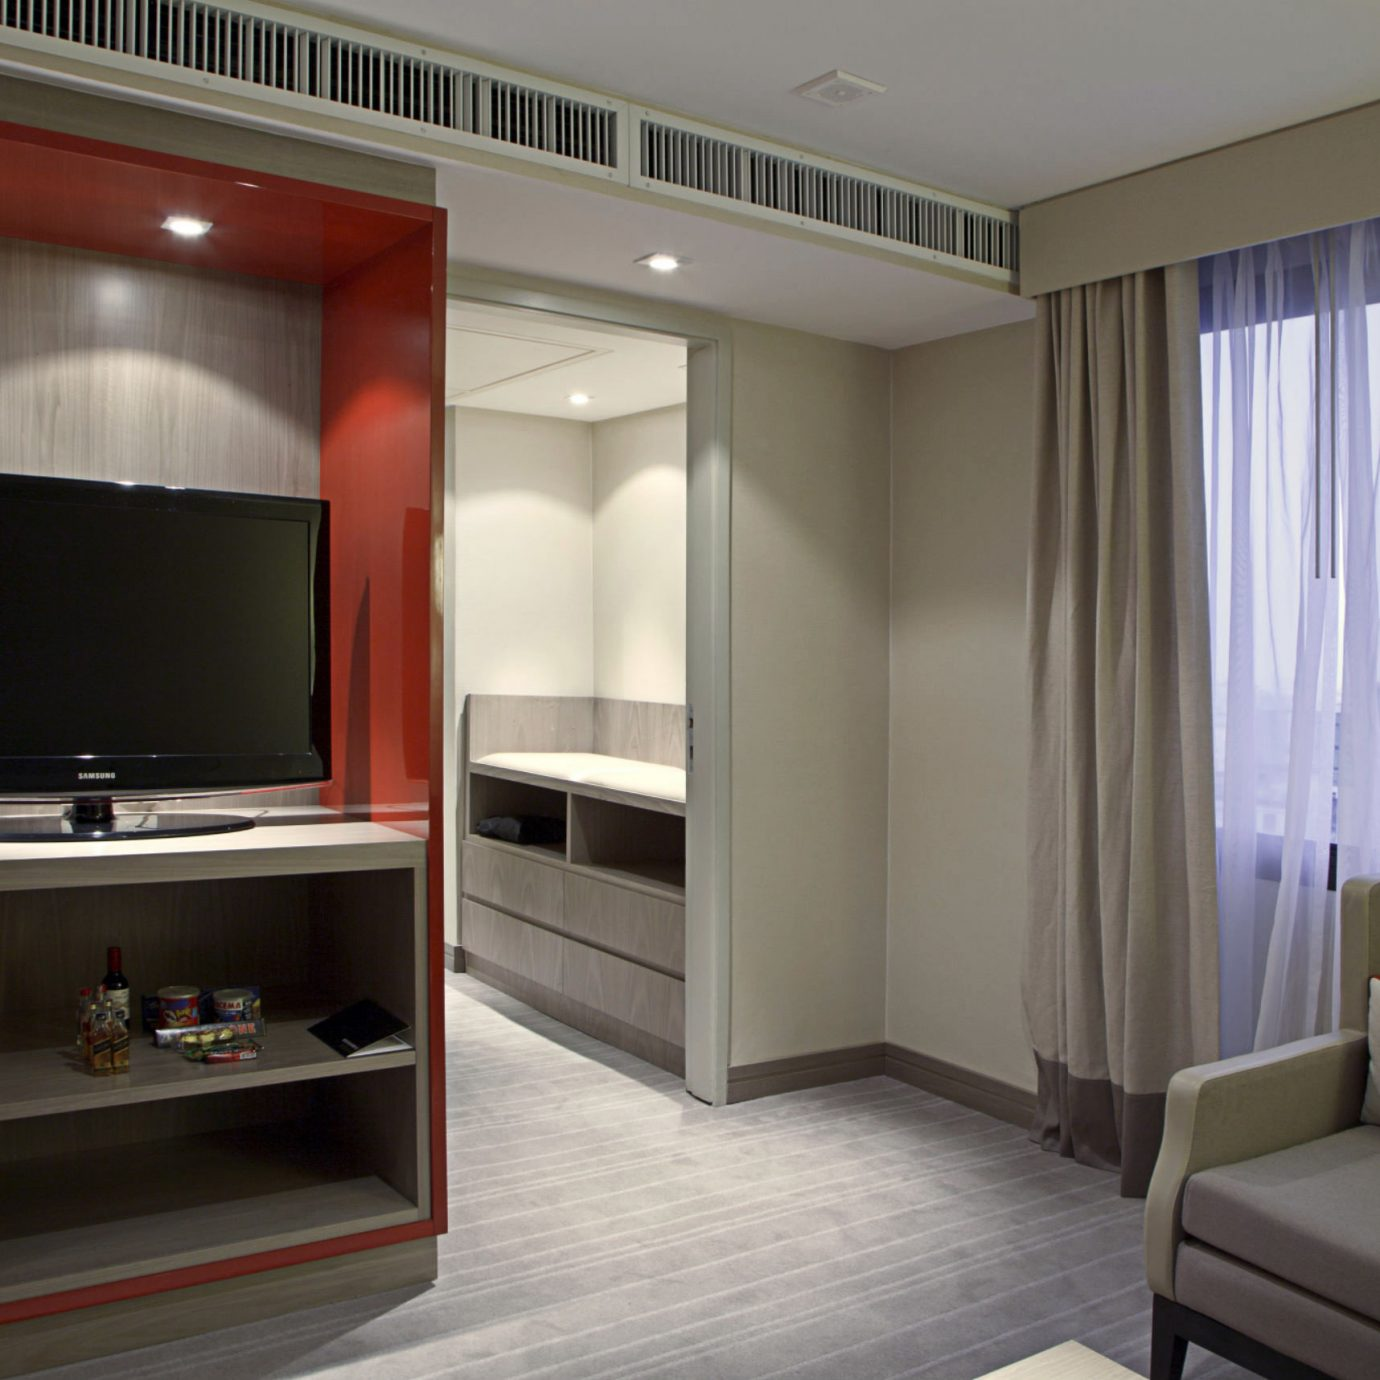 Bedroom Classic Entertainment Resort Suite television property living room home screen condominium flat